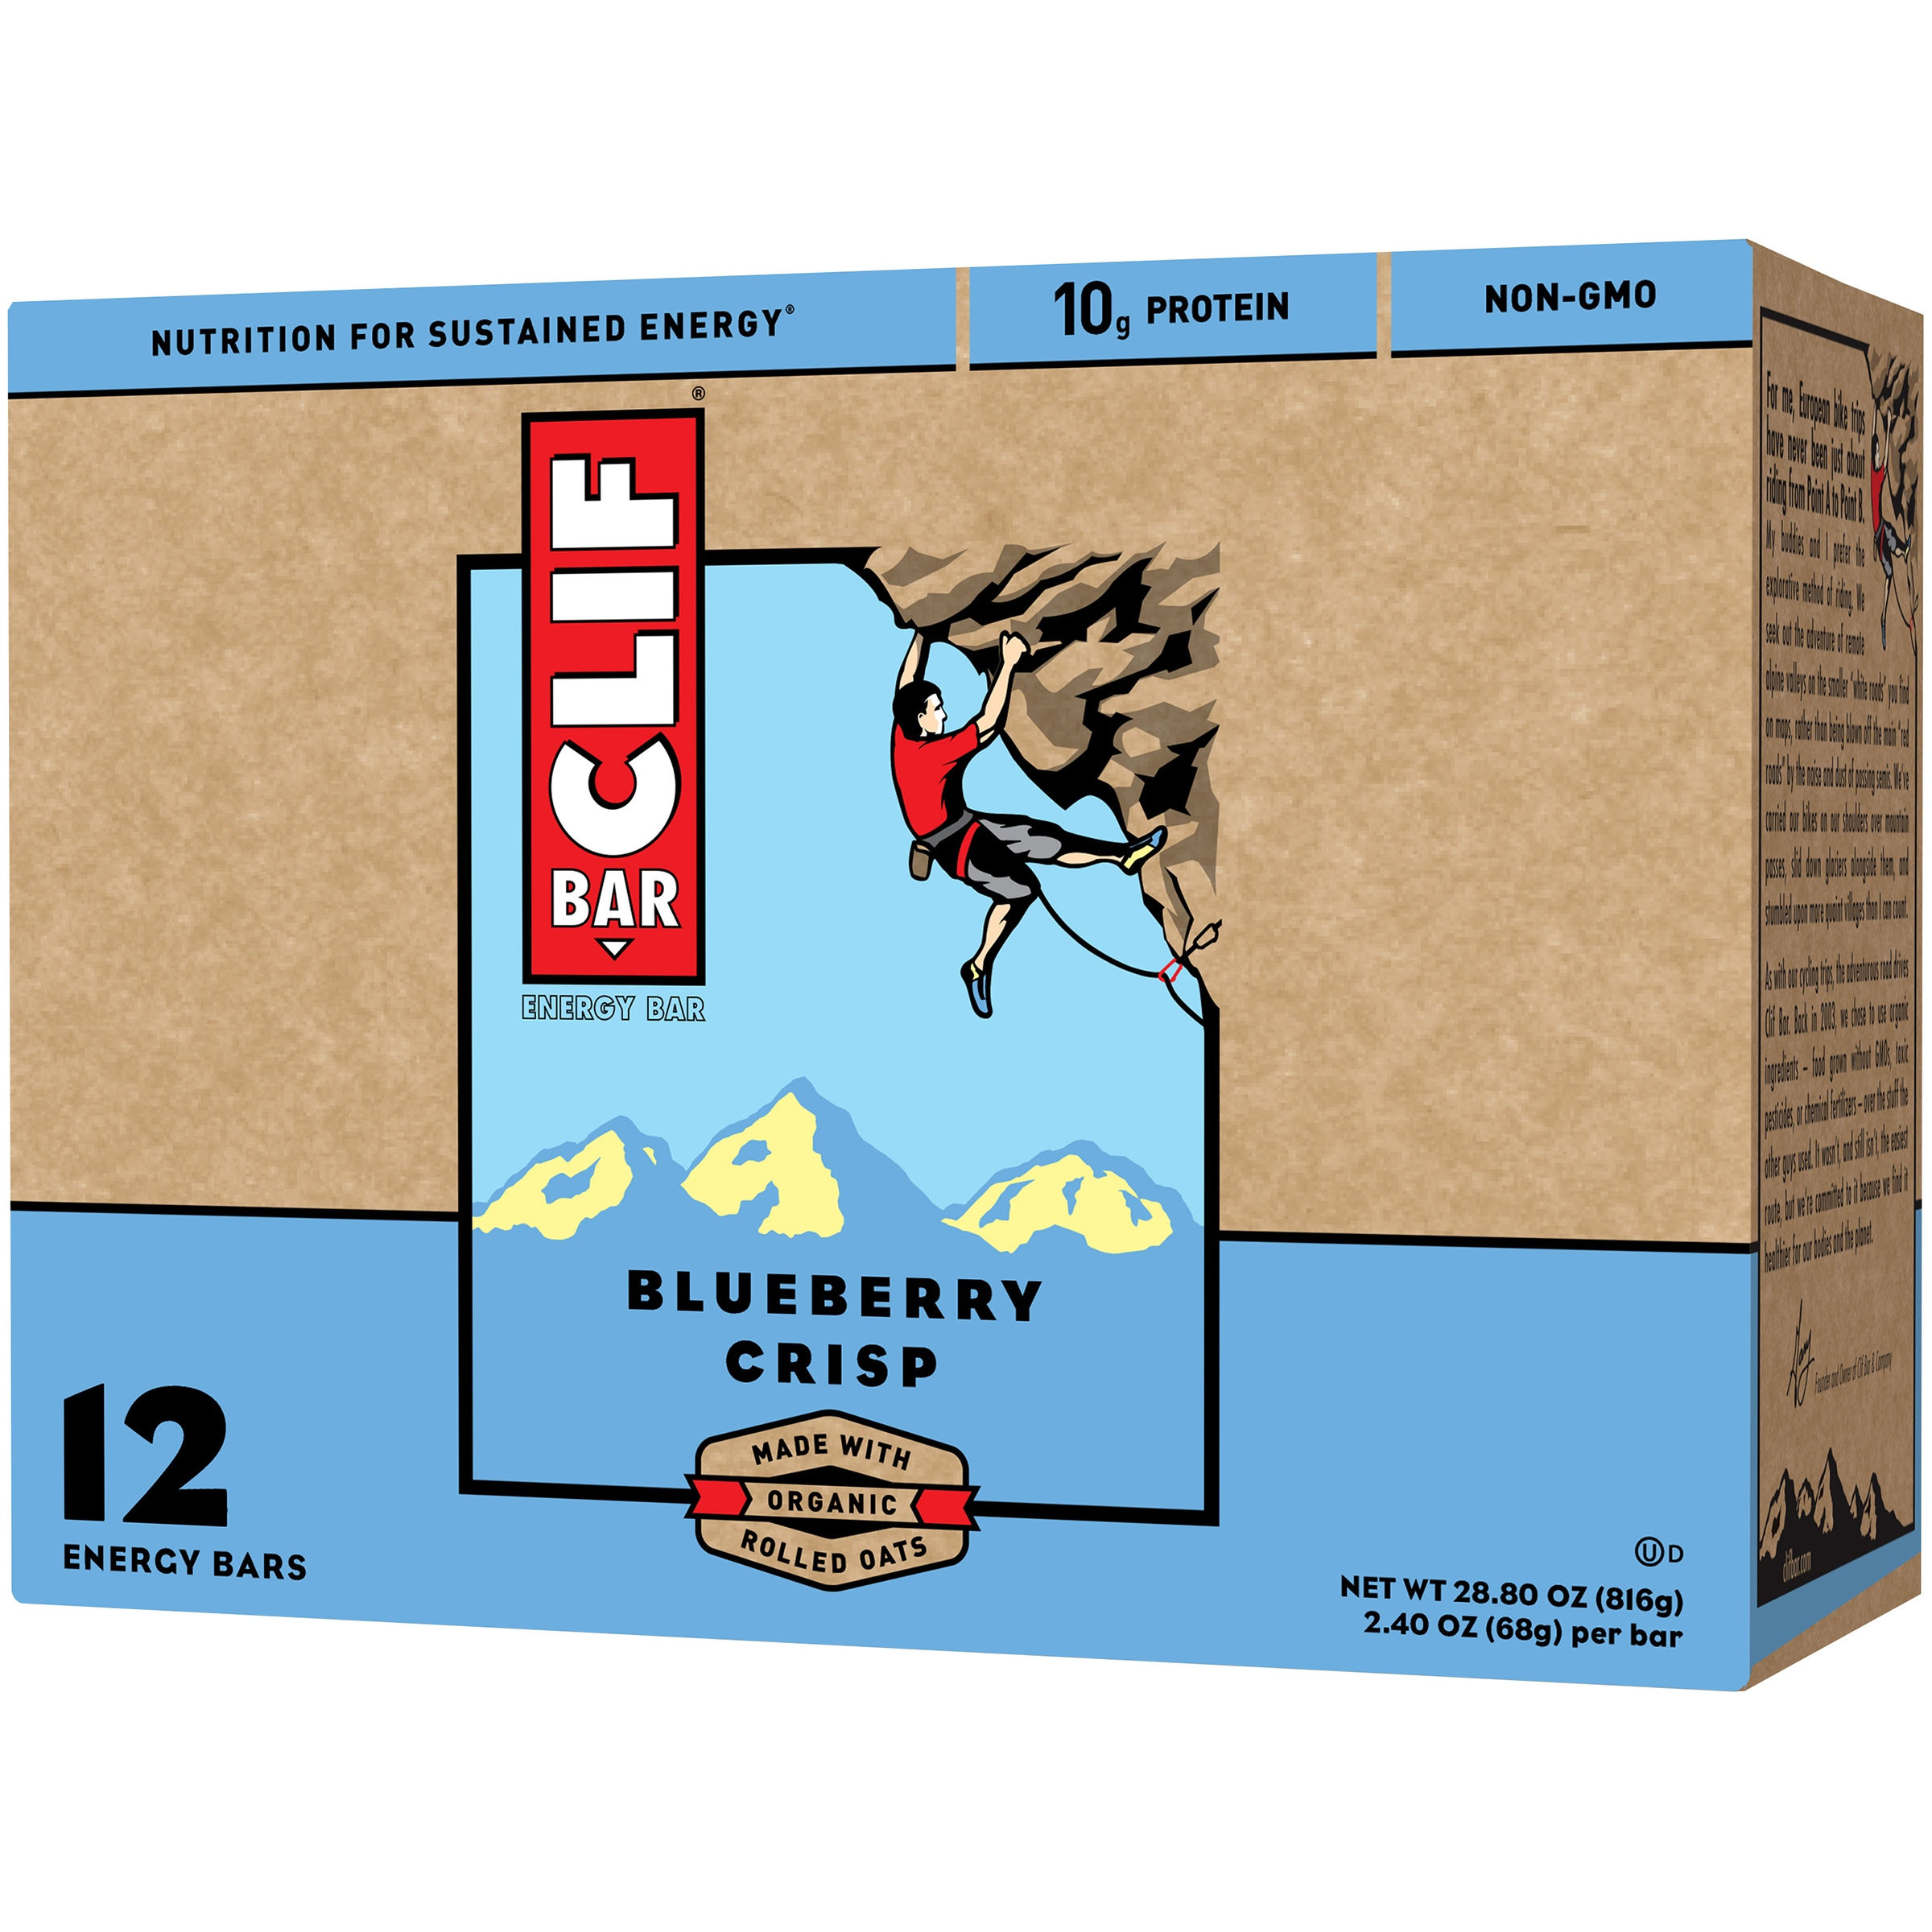 Clif Bar Blueberry Crisp Energy Bars, 2.4 oz, 12 ct by Clif Bar & Company